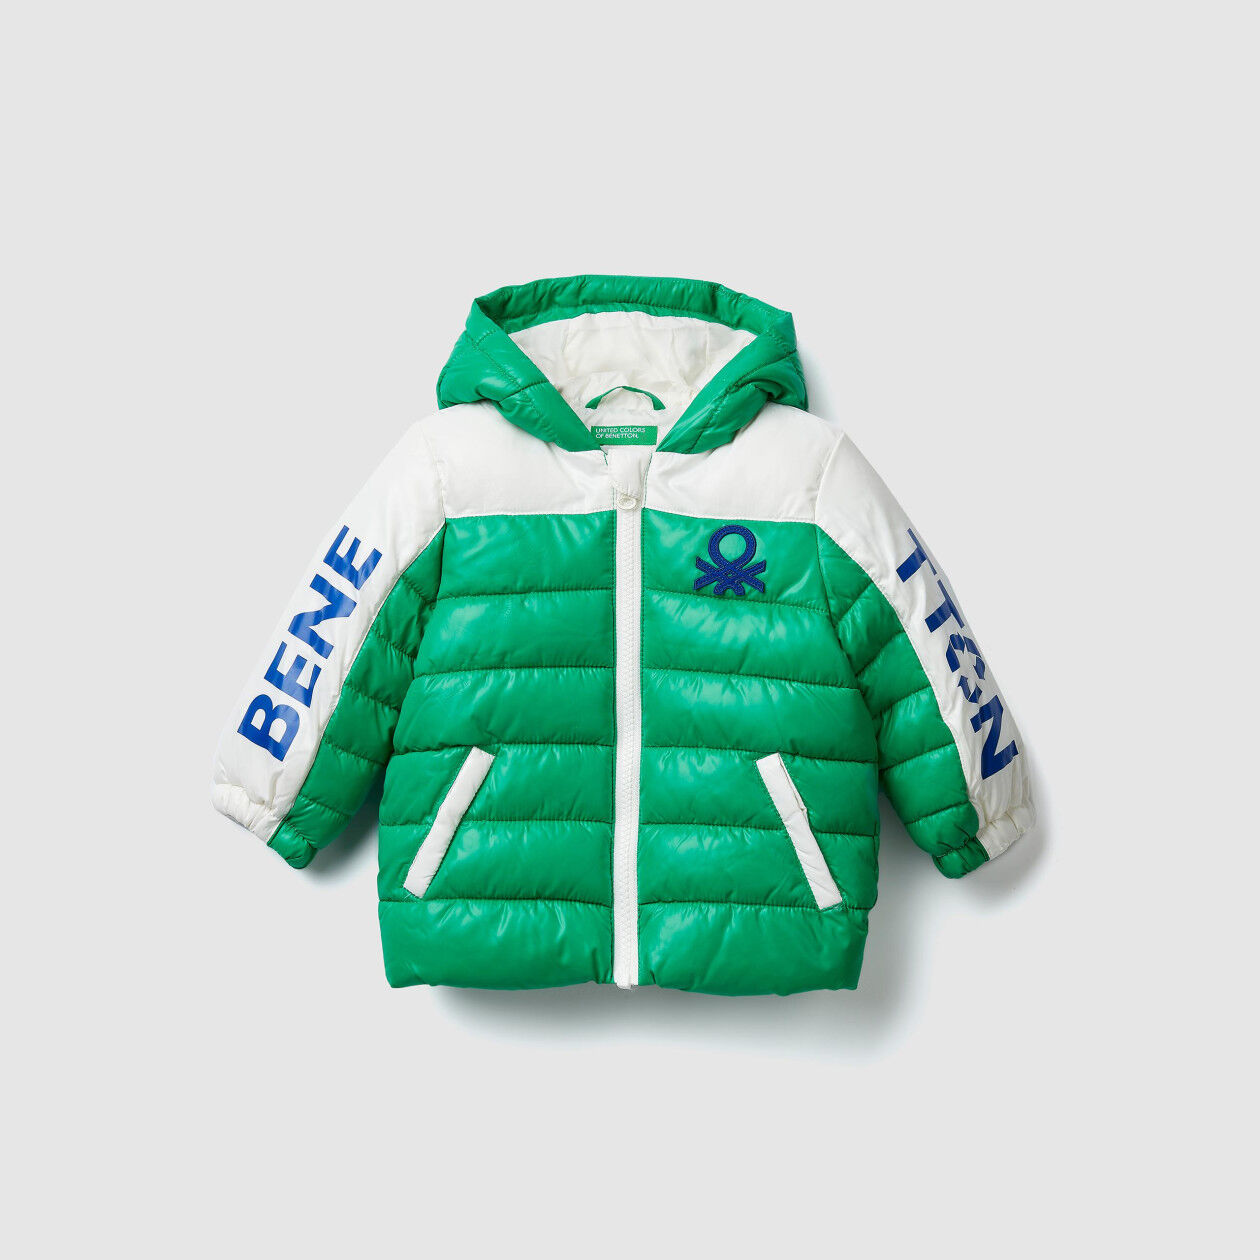 "Blouson ""Eco-Recycle"" avec logo"